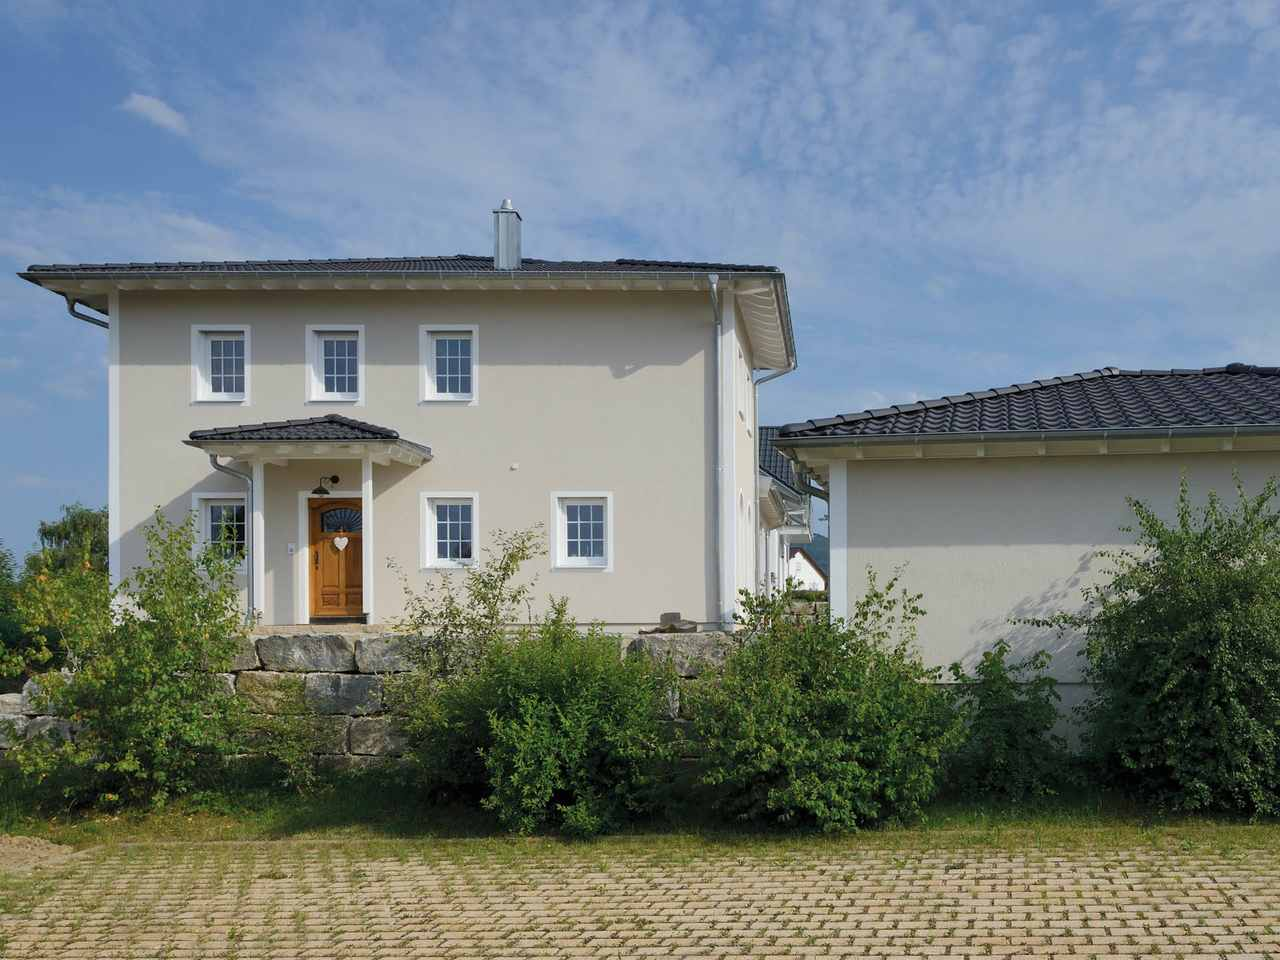 Haus Winter Eingang Fertighaus Weiss